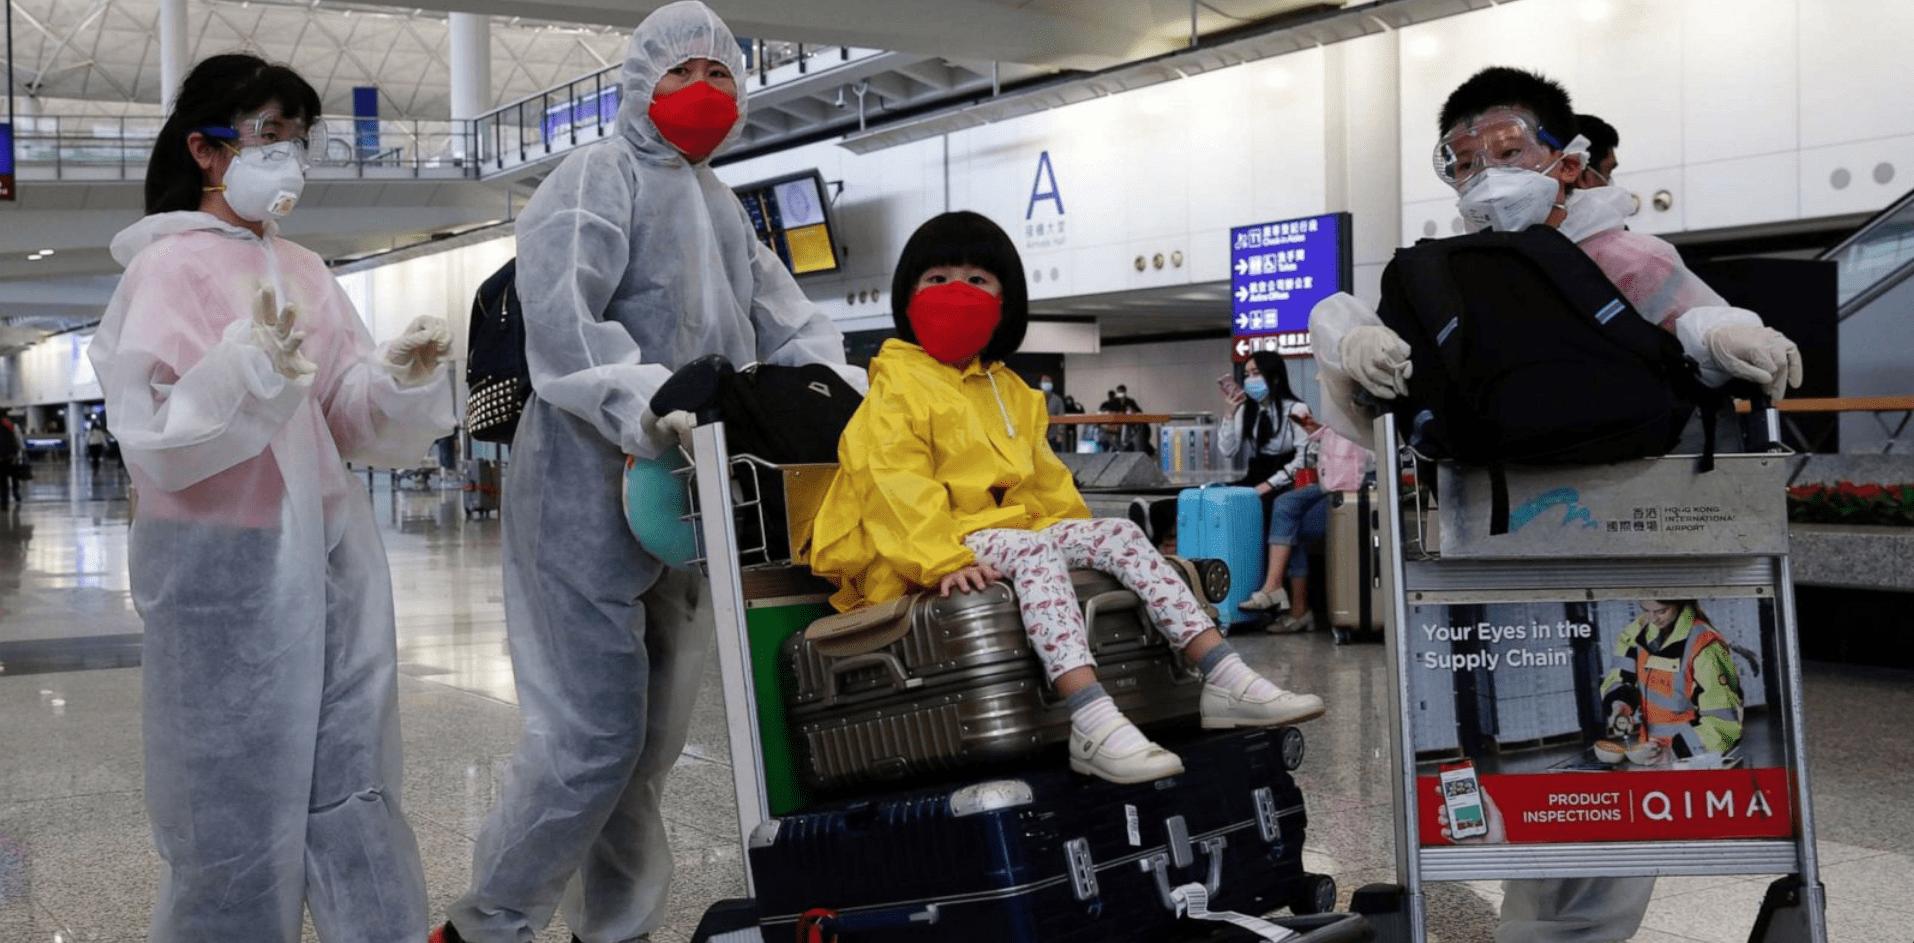 Hong Kong, Medidas, Cuarentena, Aislamiento, Covid-19, China, Viajeros, Extranjeros, Pandemia,